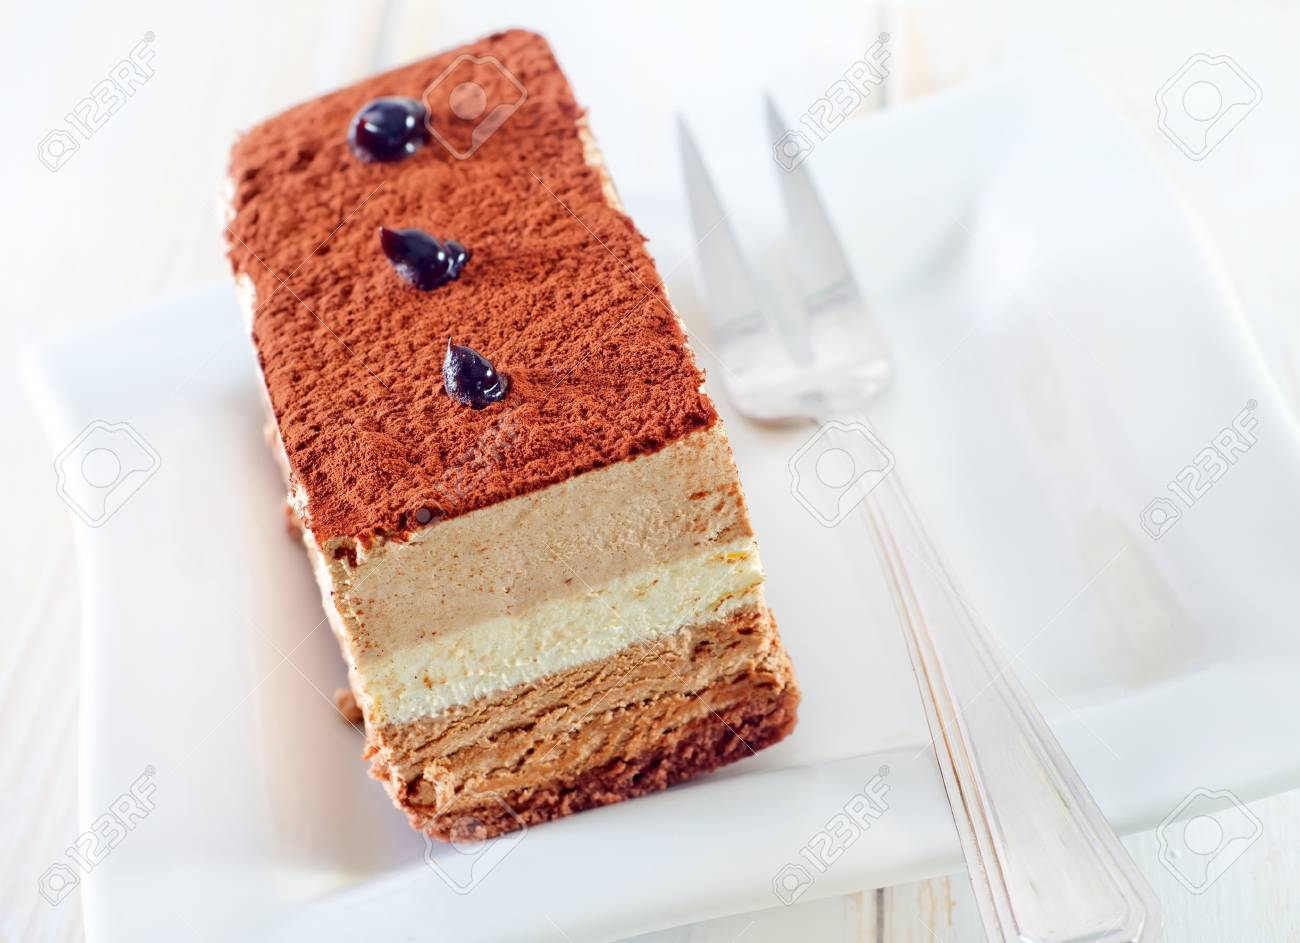 cake with chocolate Stock Photo - 17536338